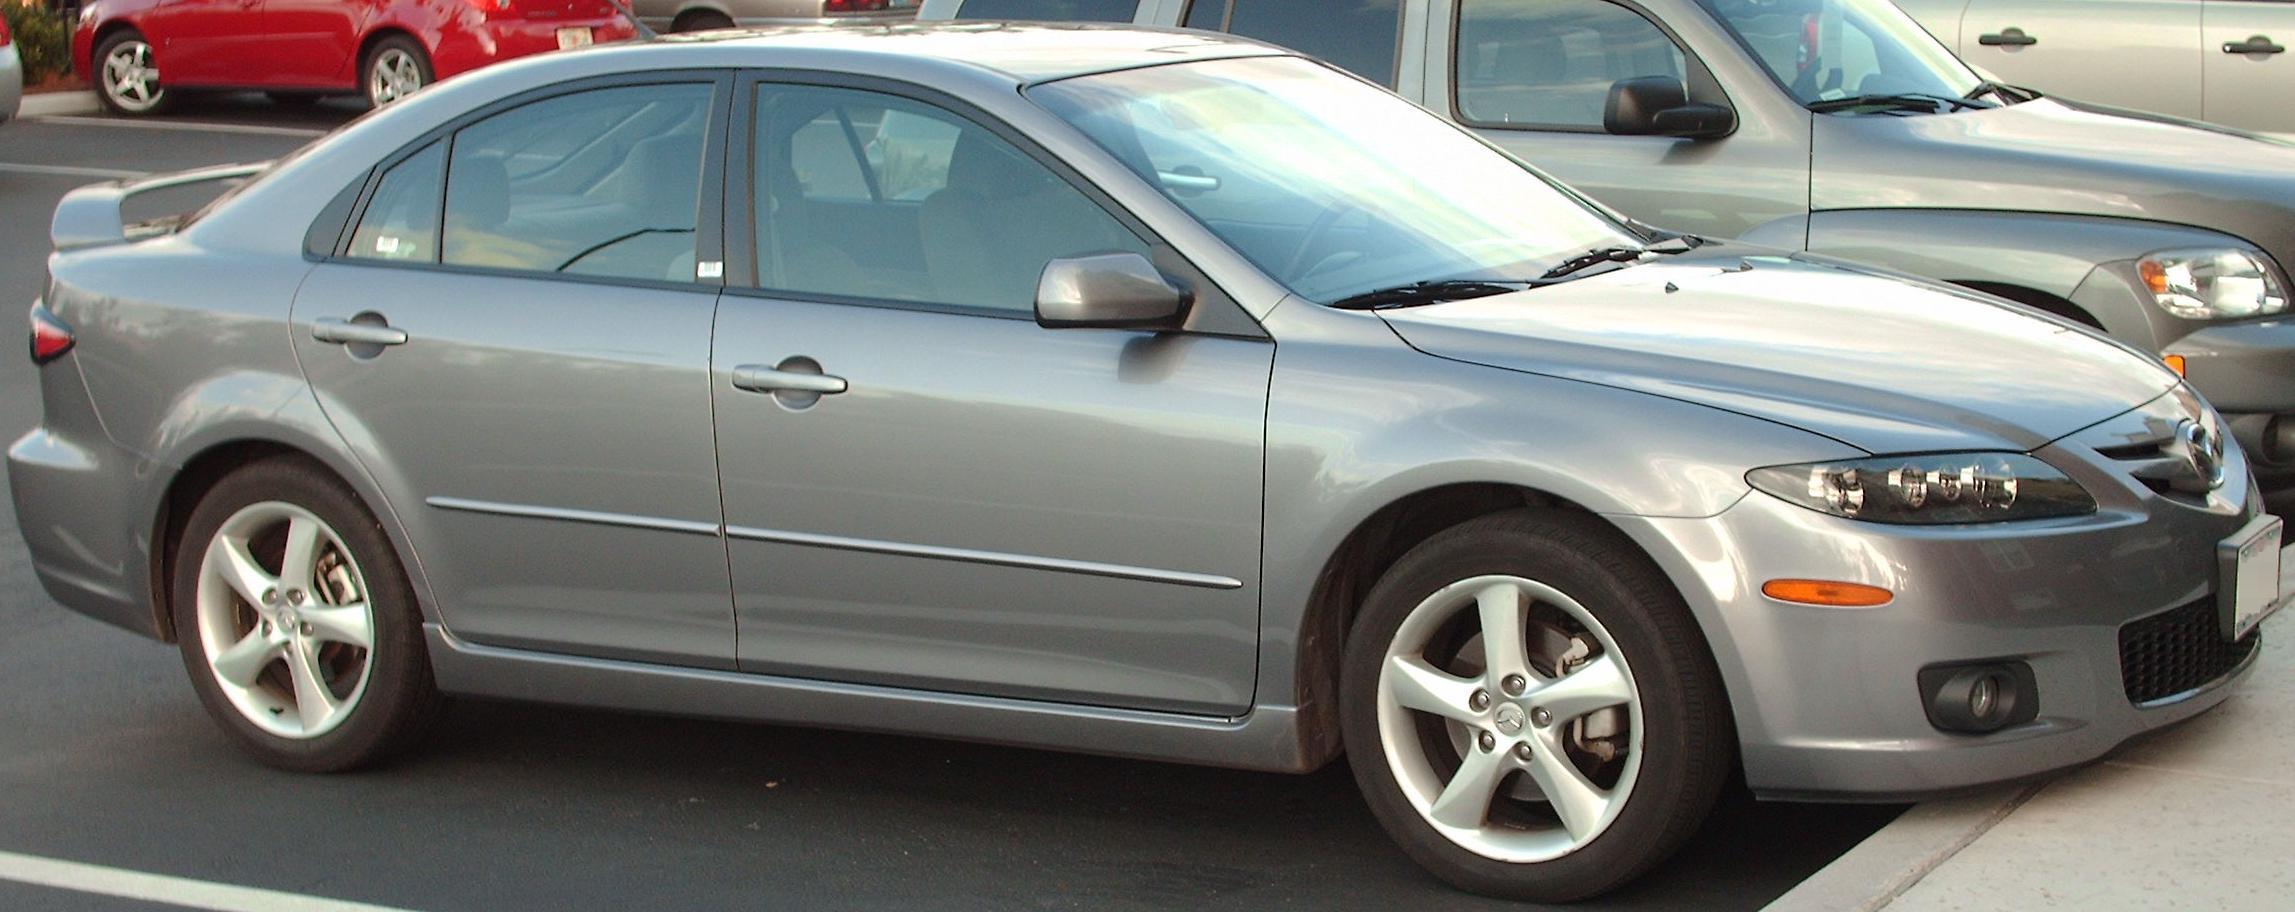 file:'03-'05 mazda6 hatchback - wikimedia commons